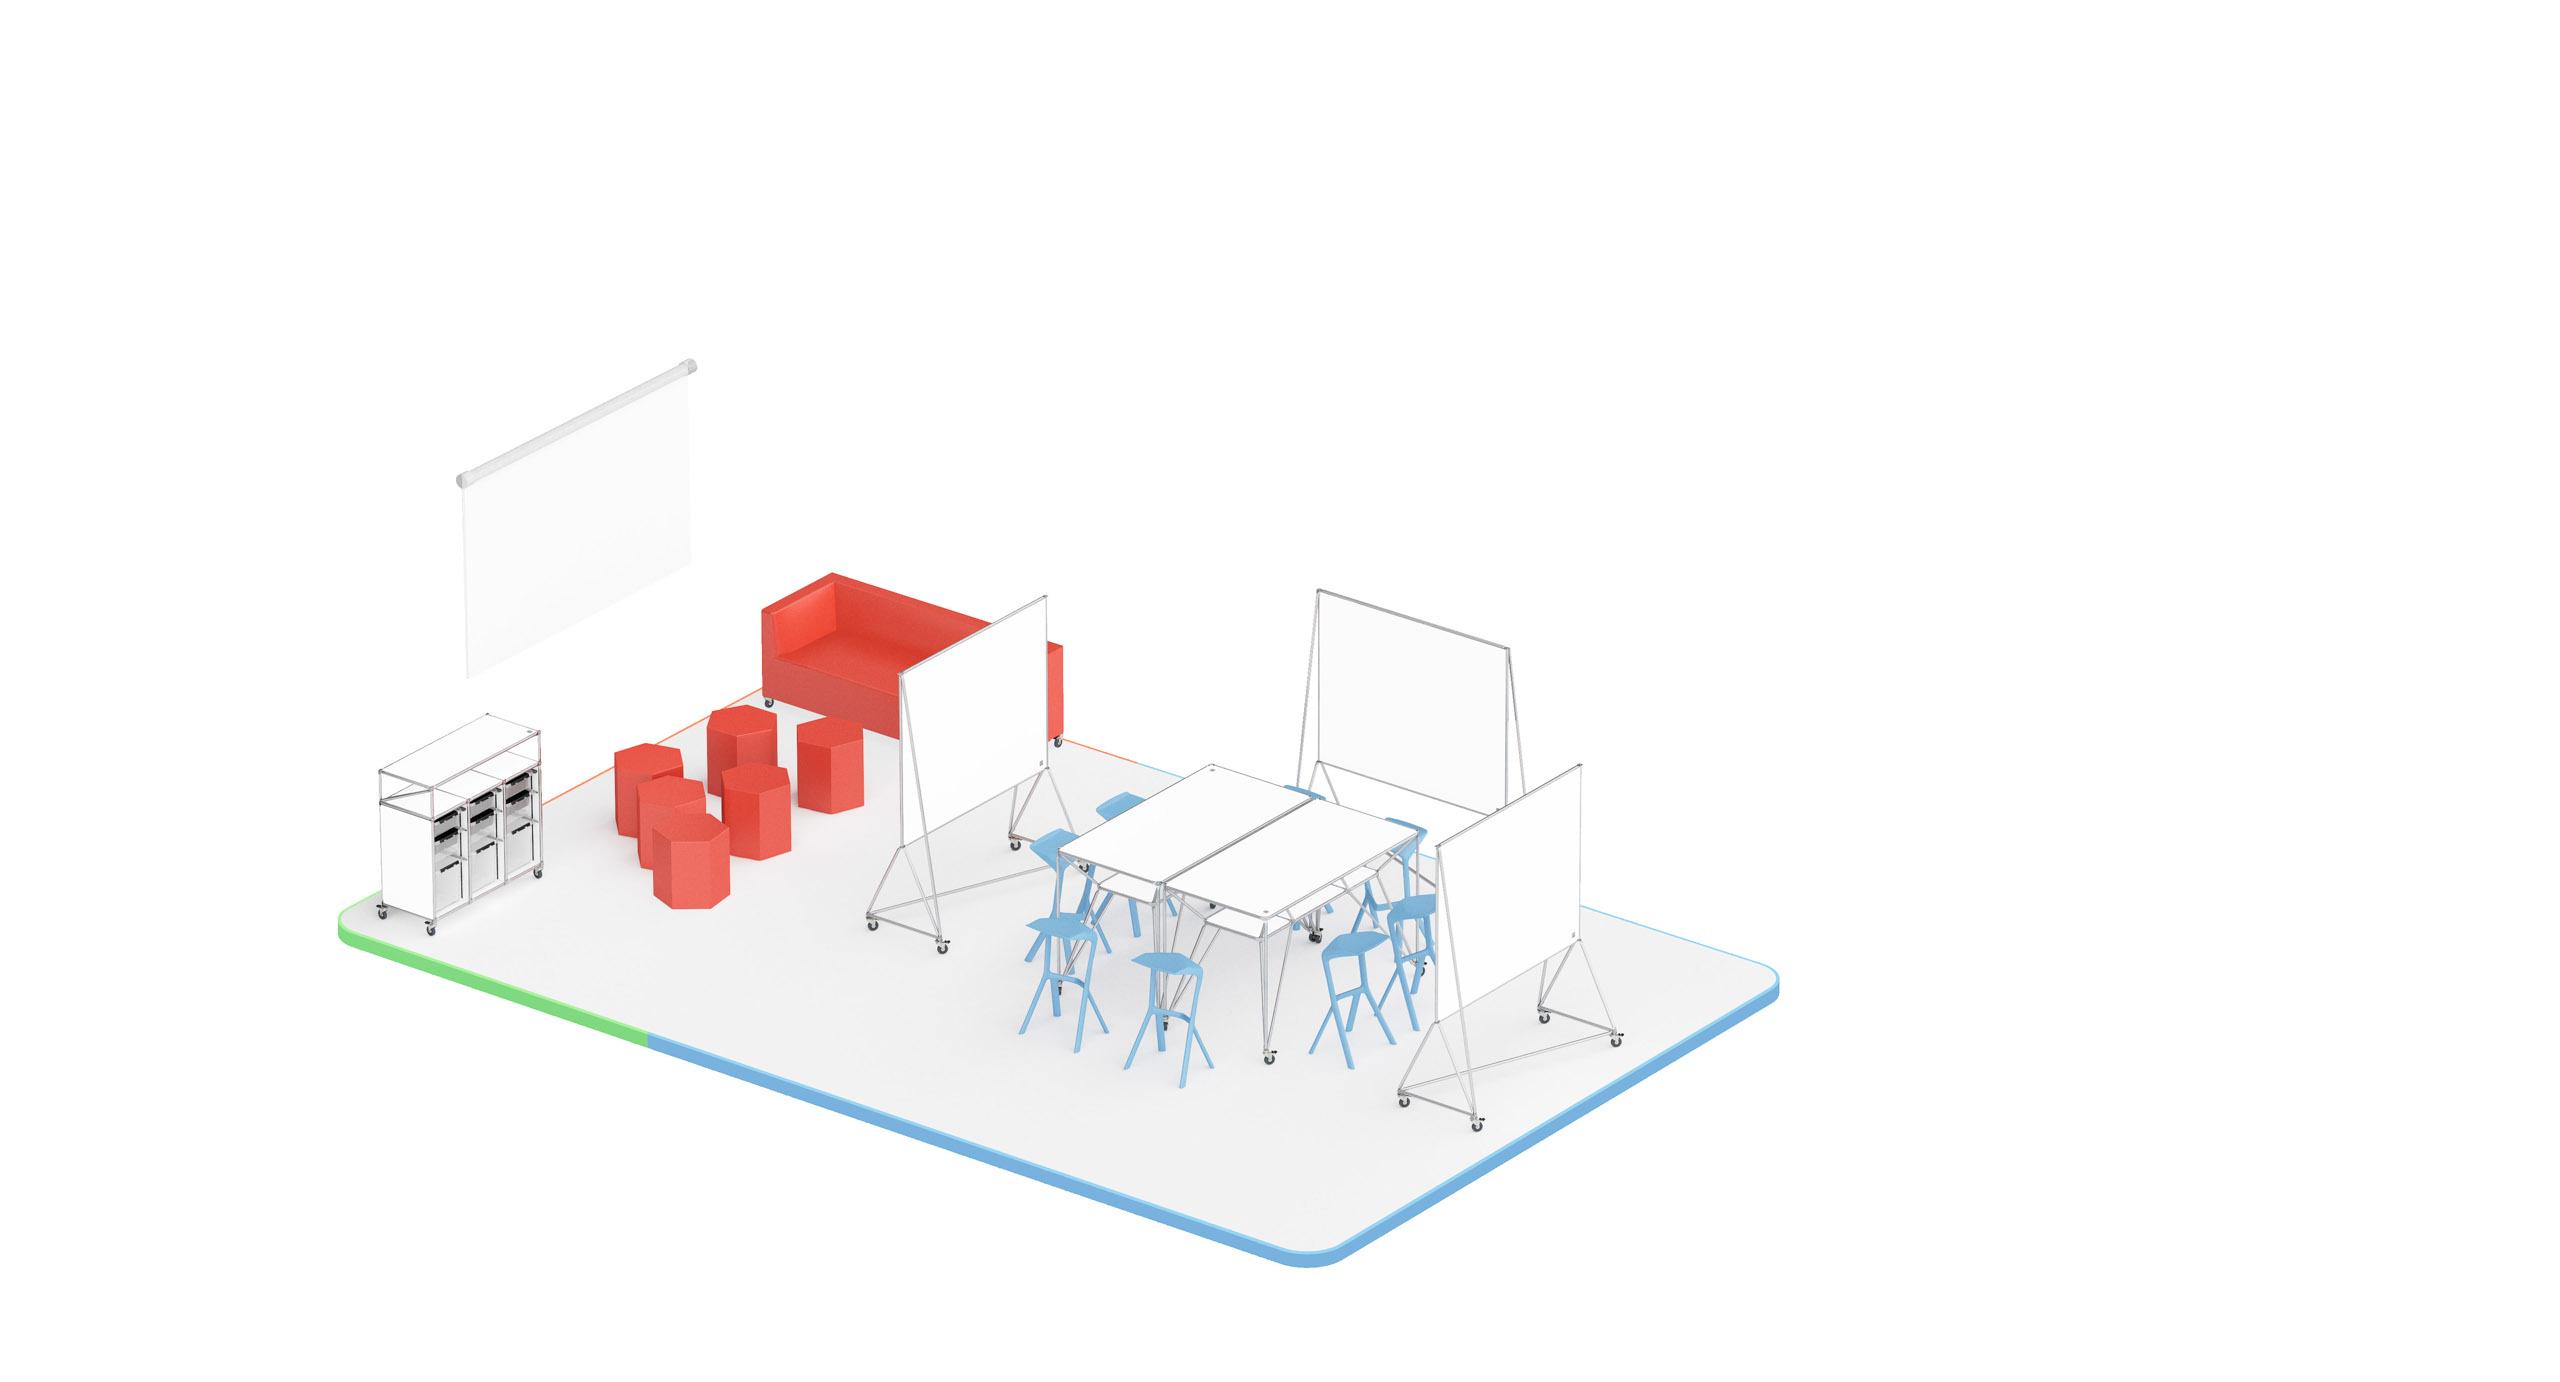 images design thinking system 180 modulare einrichtung aus berlin. Black Bedroom Furniture Sets. Home Design Ideas